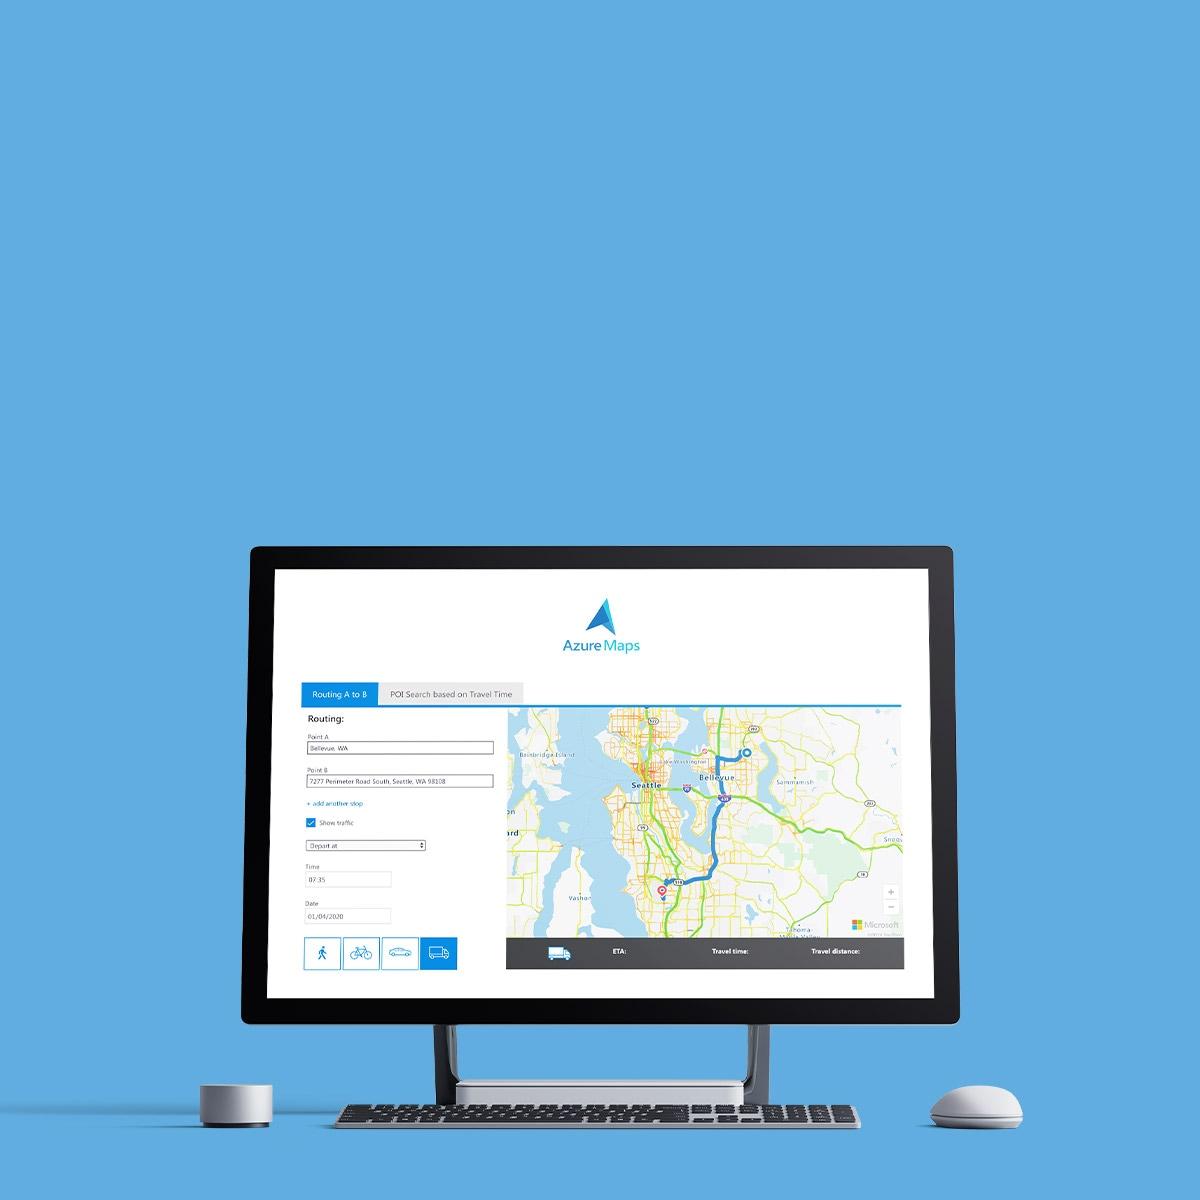 Microsoft Azure and TomTom